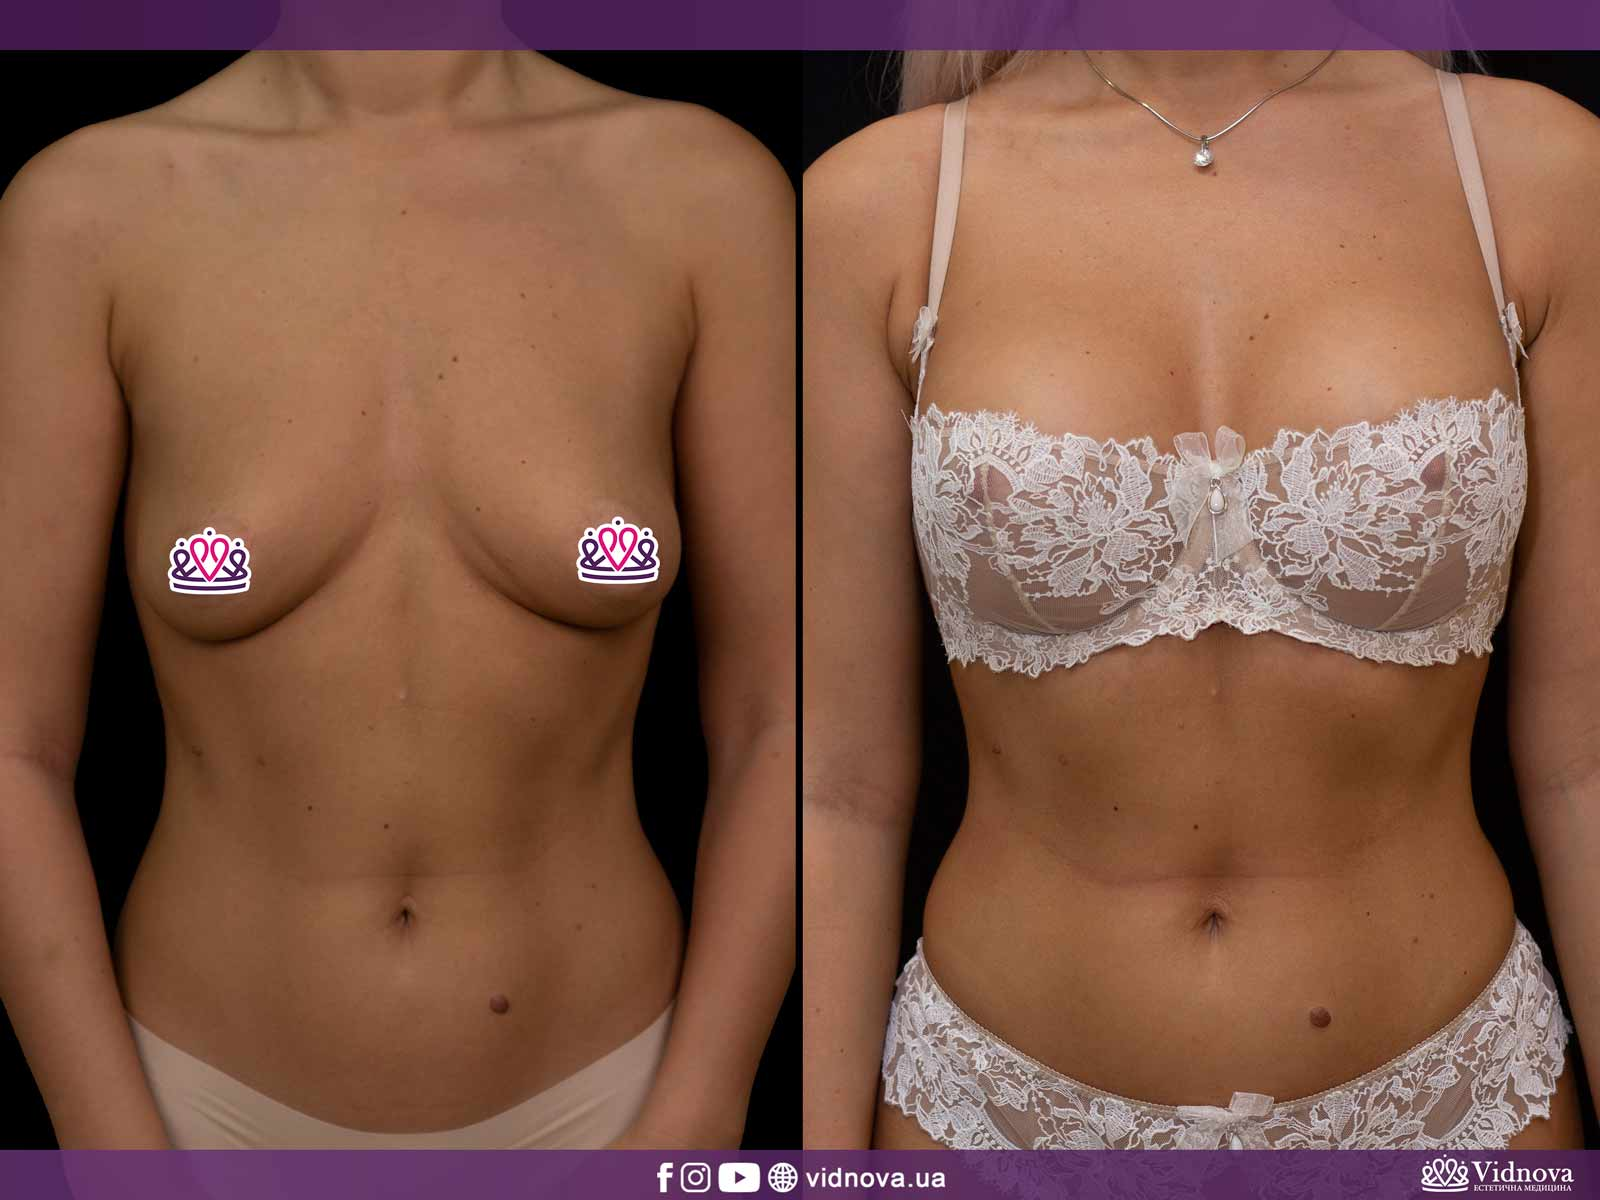 Увеличение груди: Фото ДО и ПОСЛЕ - Пример №10-1 - Клиника Vidnova